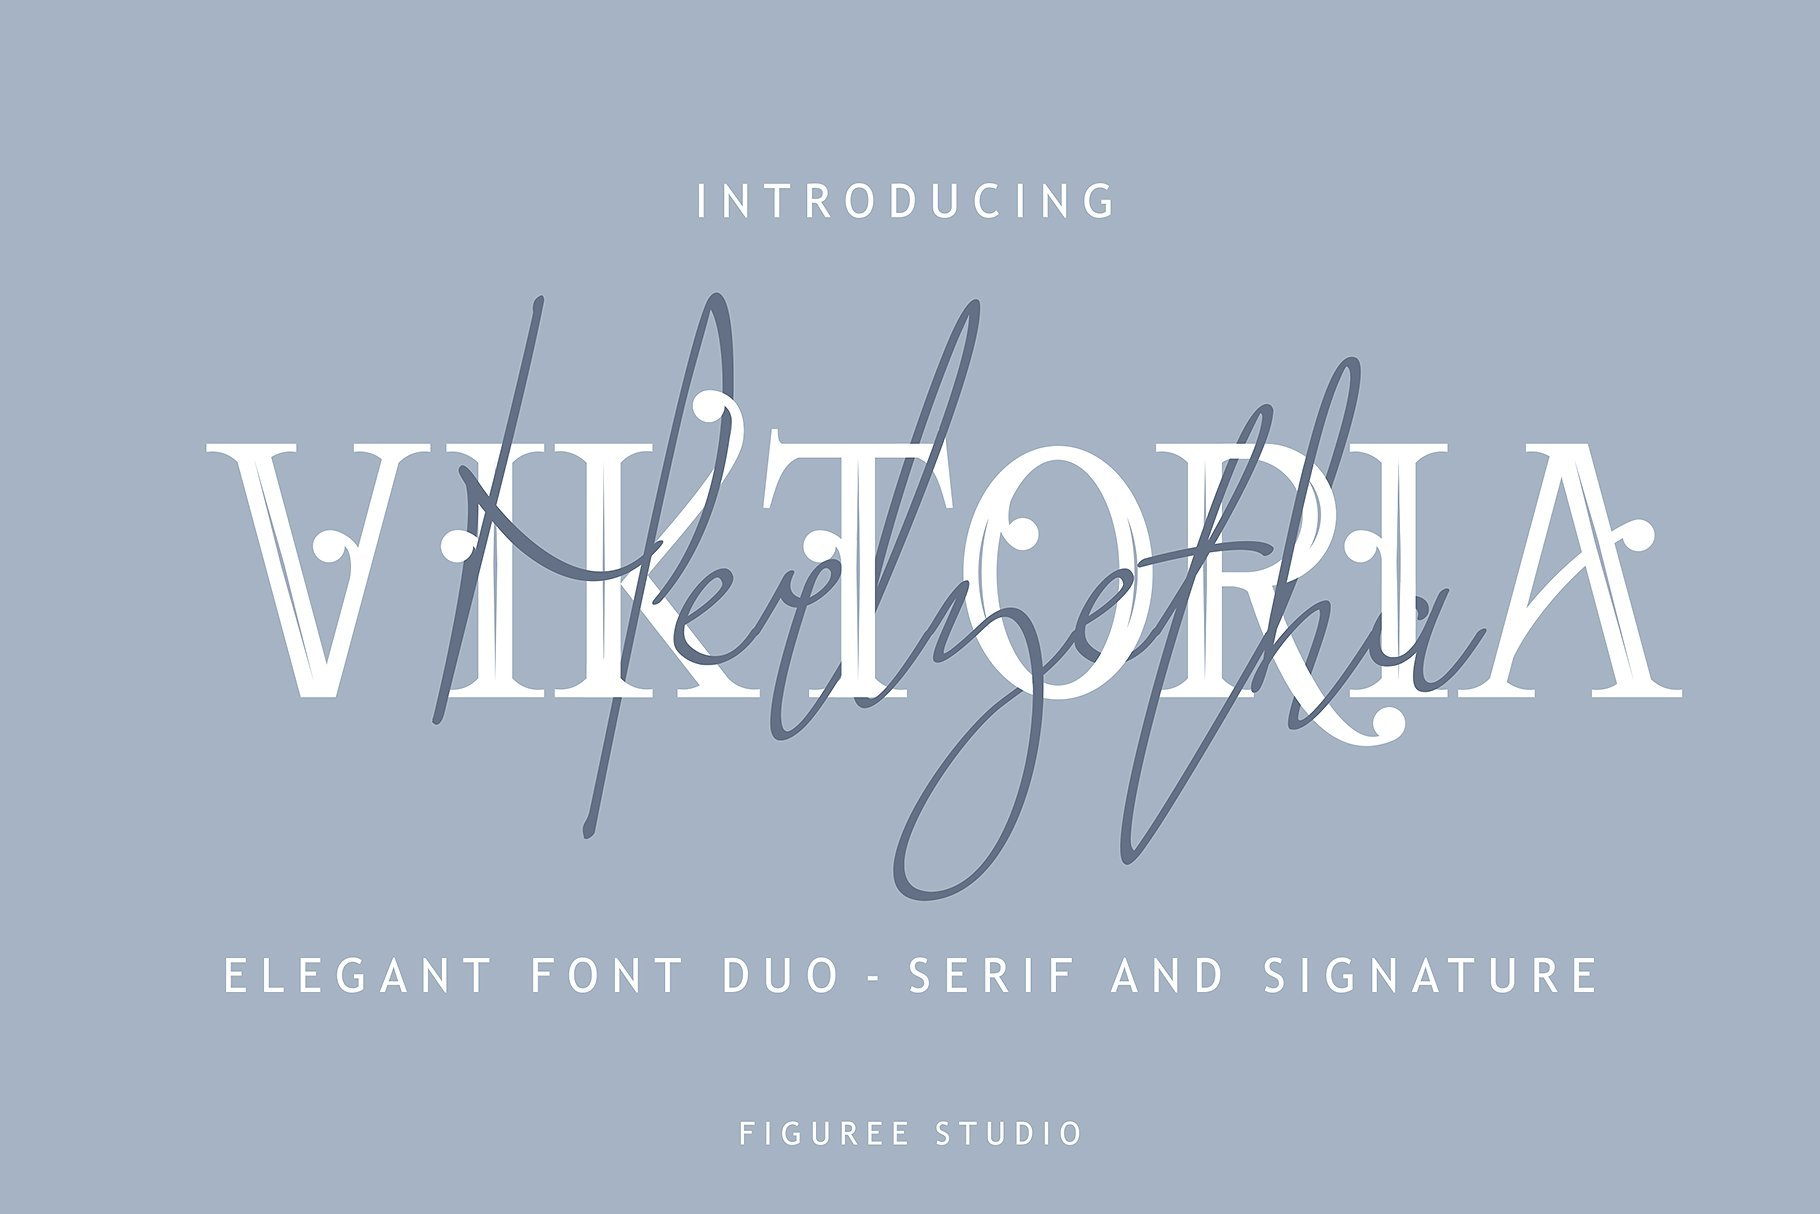 https://fontclarity.com/wp-content/uploads/2019/09/viktoria-elegant-font-duo-download-0-1.jpg Free Download